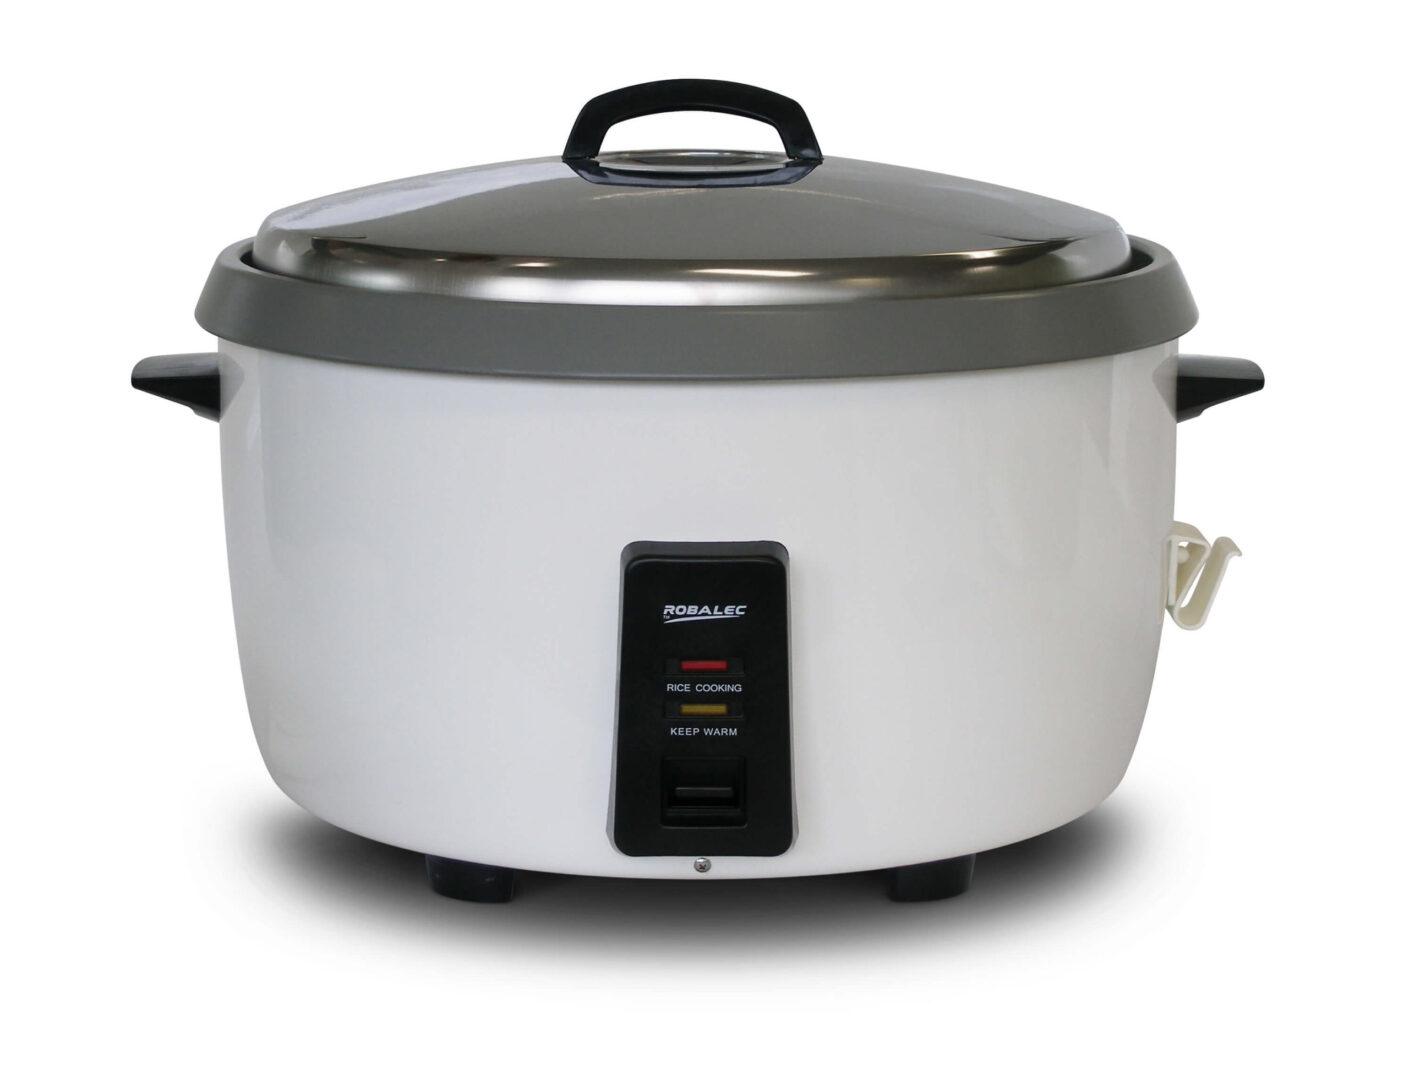 Robalec SW10000 Rice Cooker - large